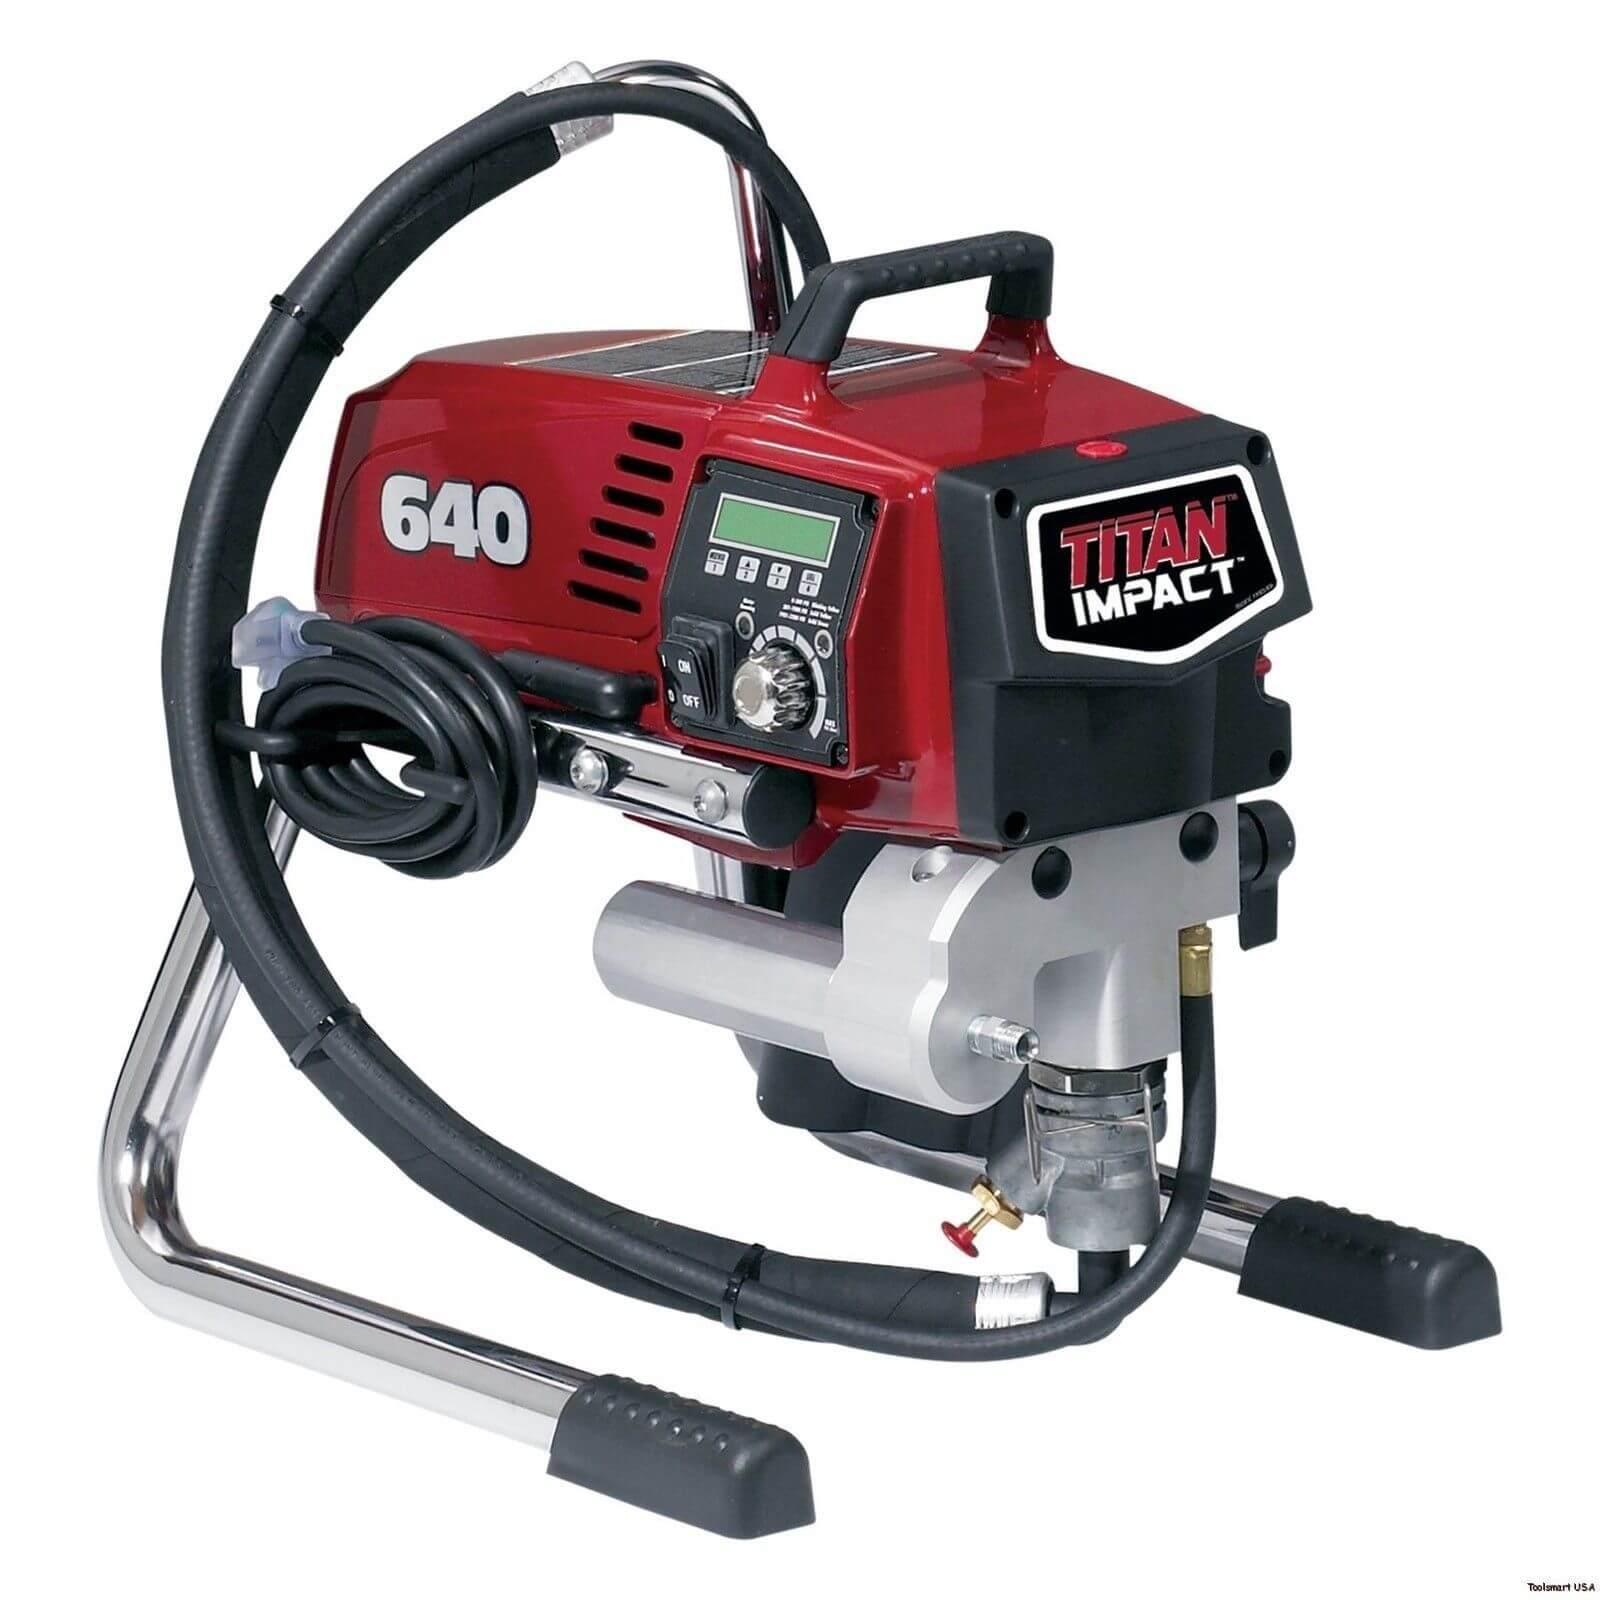 Hire Paint Sprayer 640i |Tool Hire |Airless Sprayer Hire